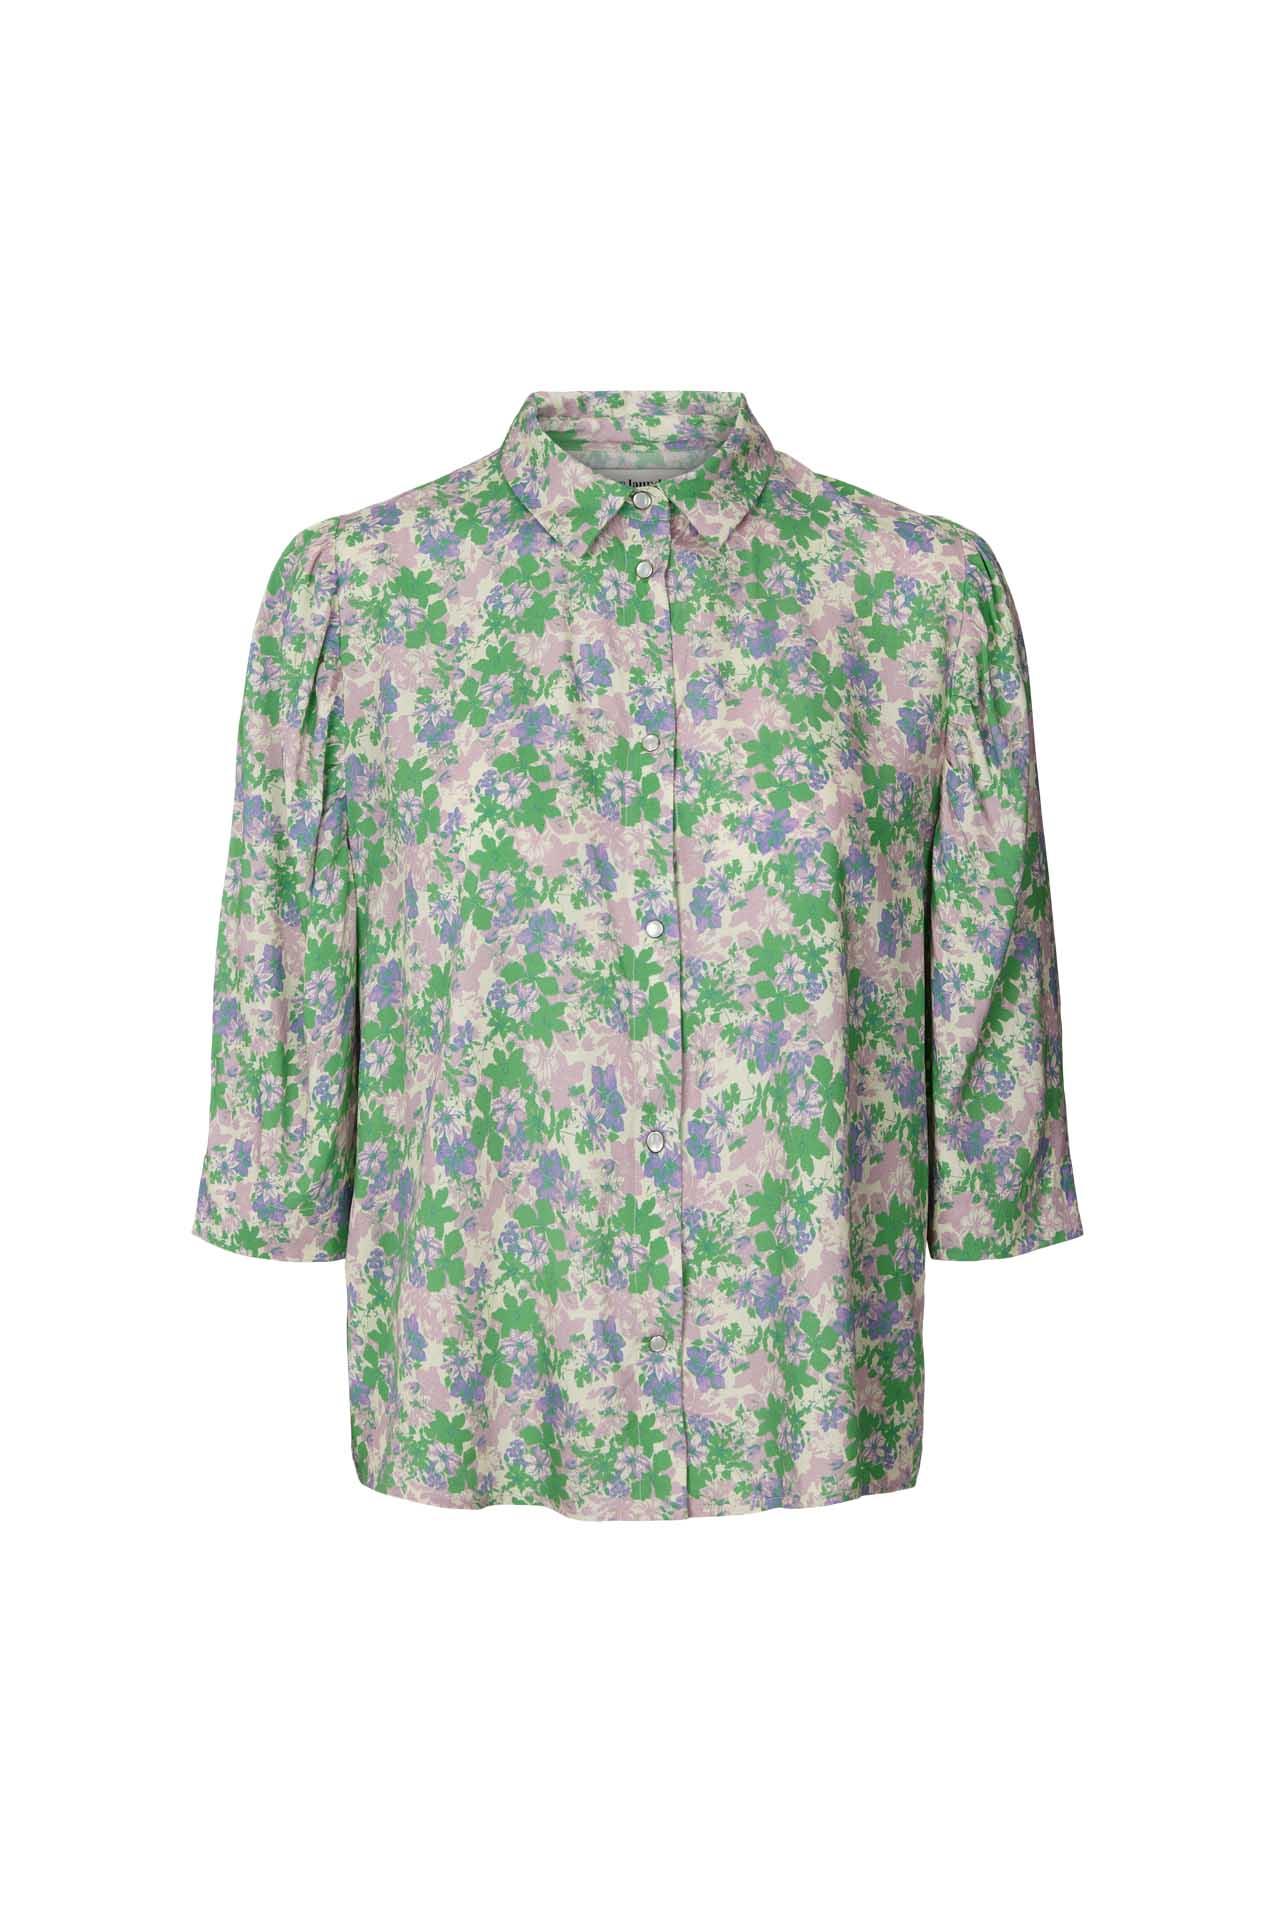 Lollys Laundry Bono skjorte